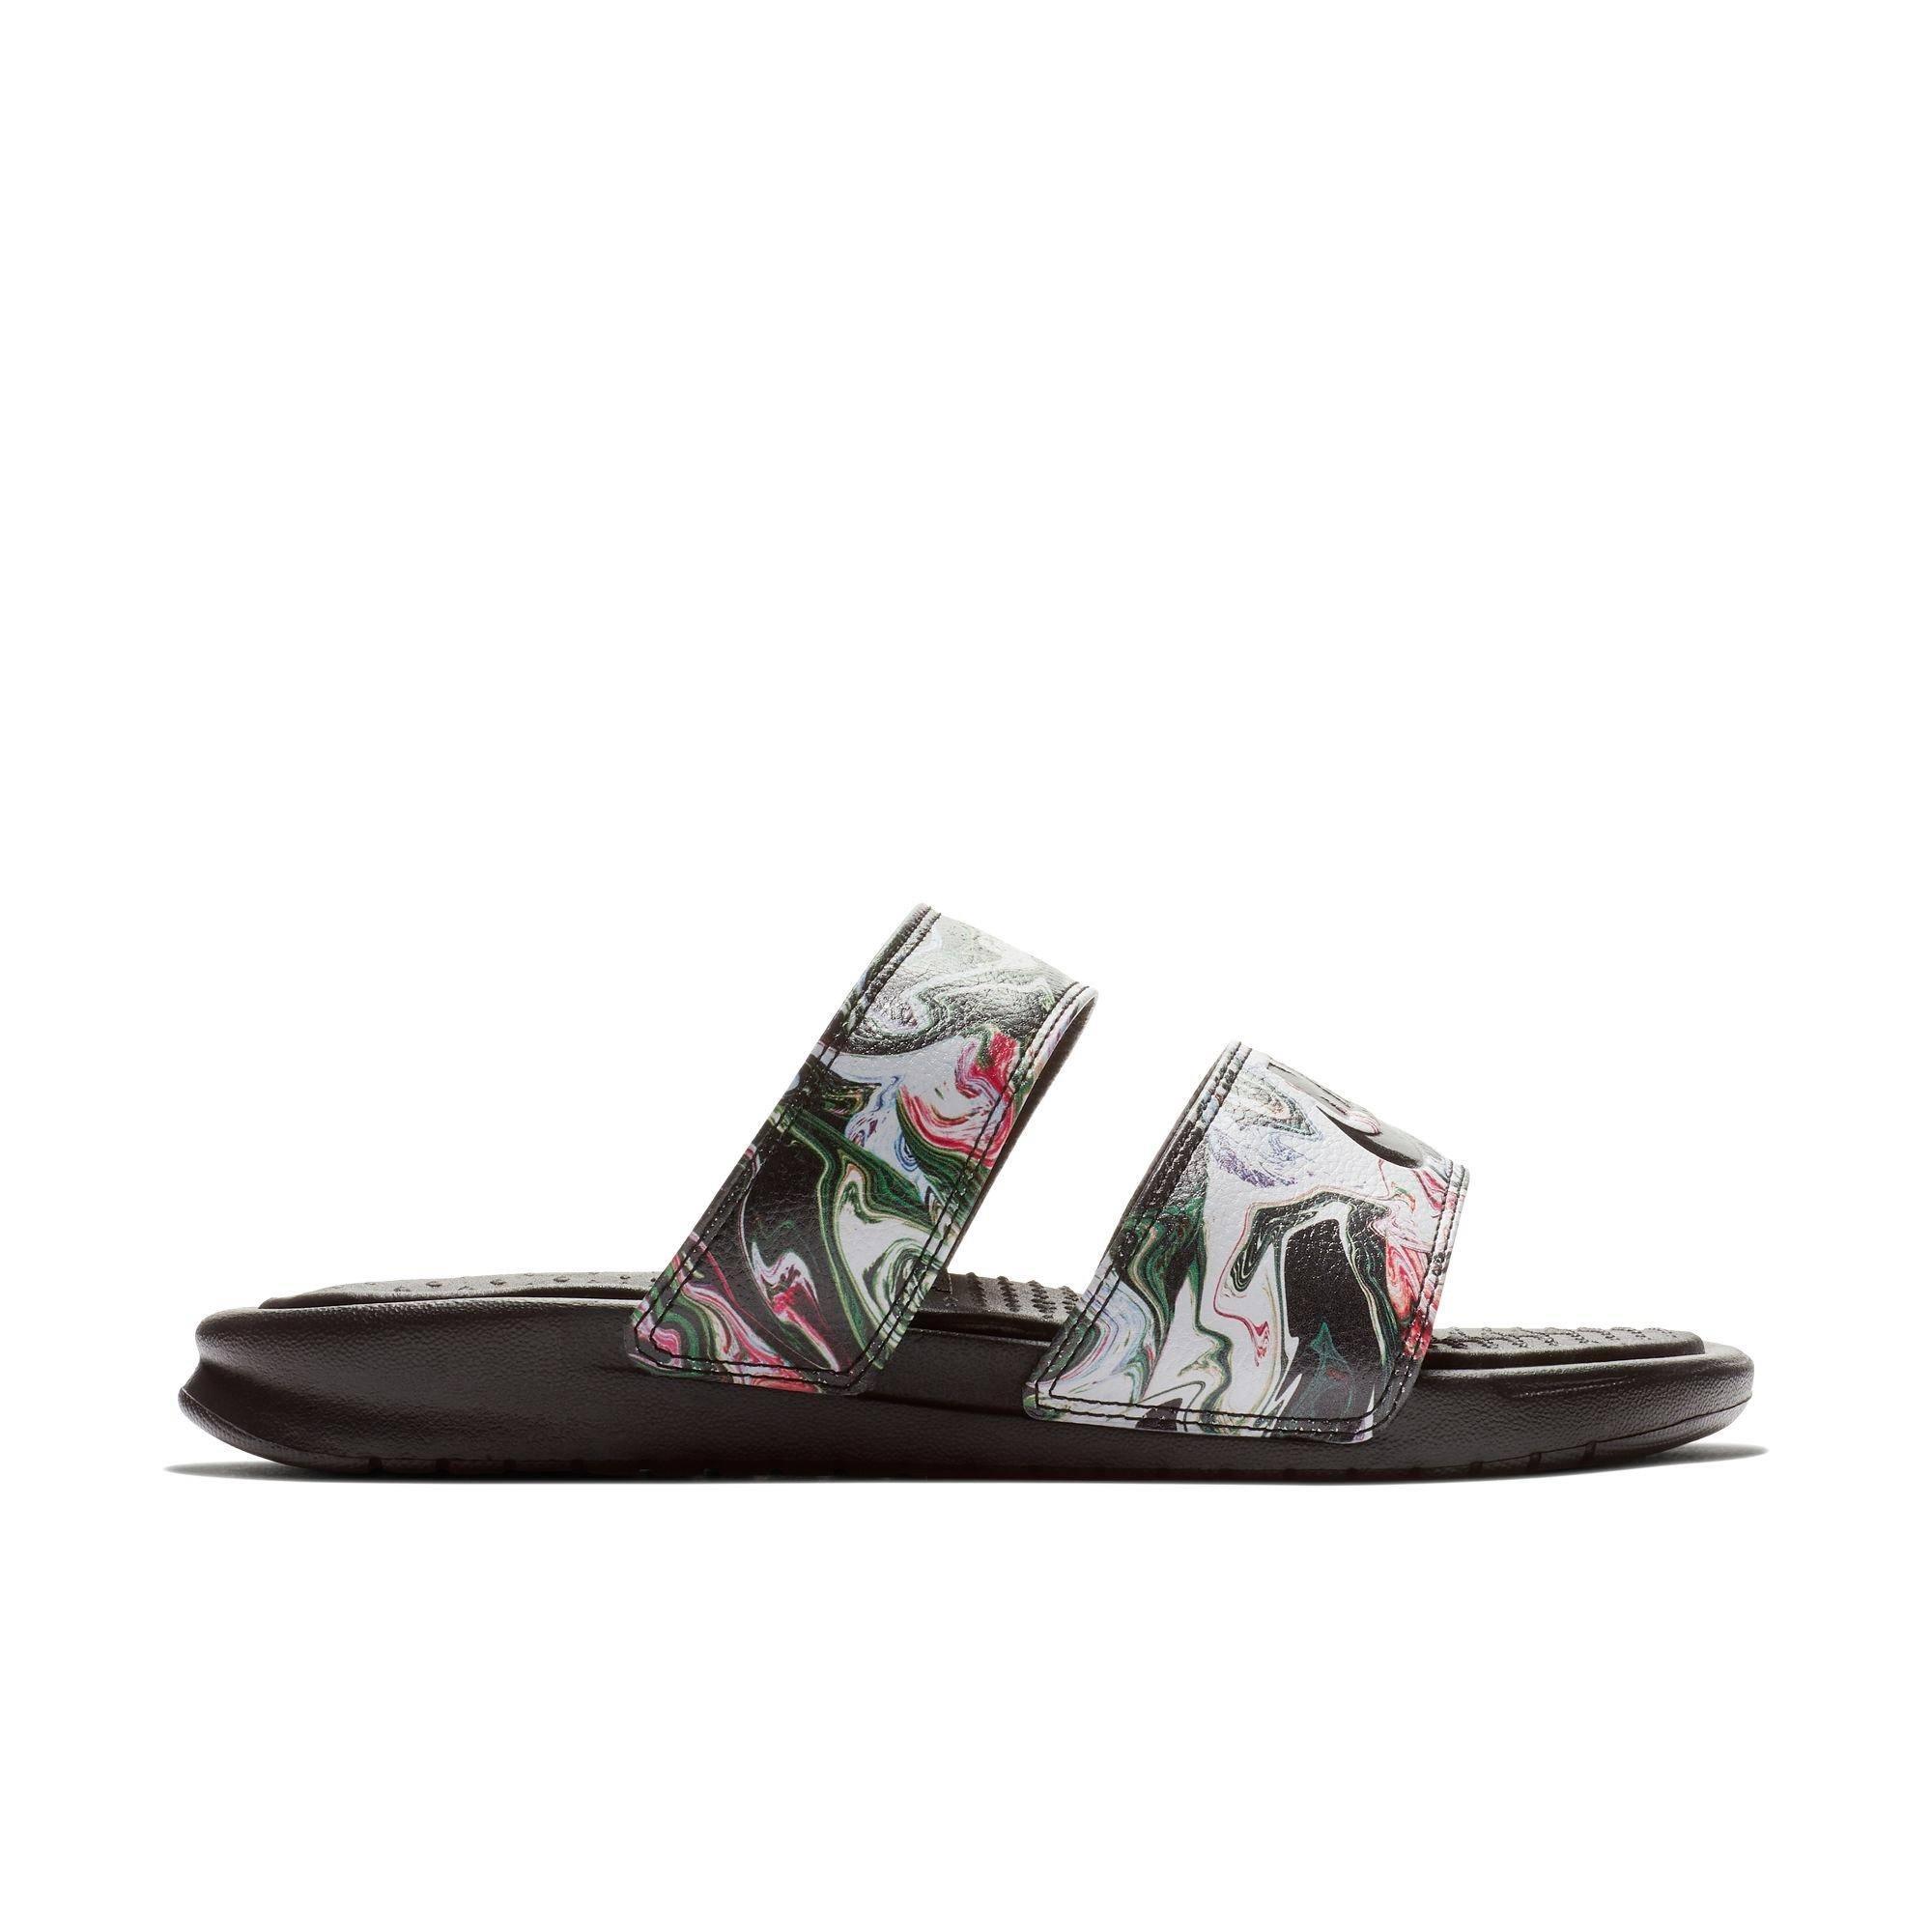 Nike Duo Benassi 8 Mujer Negro Tamaño Ultra Slide 819717003 rv8rndq5w